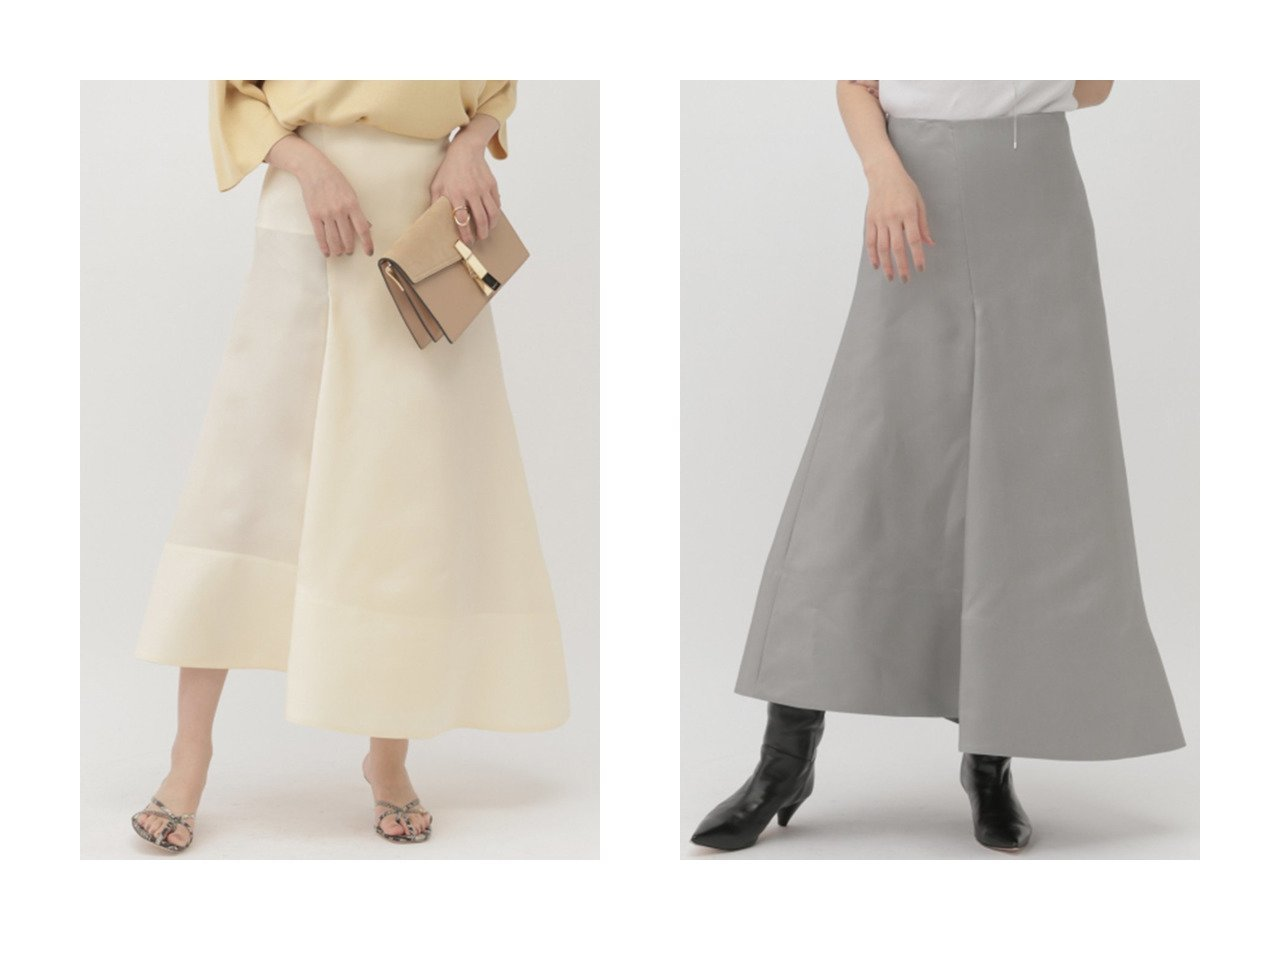 【Chaos/カオス】のダブルオーガンスカート スカートのおすすめ!人気、トレンド・レディースファッションの通販 おすすめで人気の流行・トレンド、ファッションの通販商品 メンズファッション・キッズファッション・インテリア・家具・レディースファッション・服の通販 founy(ファニー) https://founy.com/ ファッション Fashion レディースファッション WOMEN スカート Skirt ロングスカート Long Skirt 2021年 2021 2021 春夏 S/S SS Spring/Summer 2021 S/S 春夏 SS Spring/Summer アシンメトリー オーガンジー シルク ジャケット セットアップ フロント ラップ ロング 春 Spring |ID:crp329100000015298